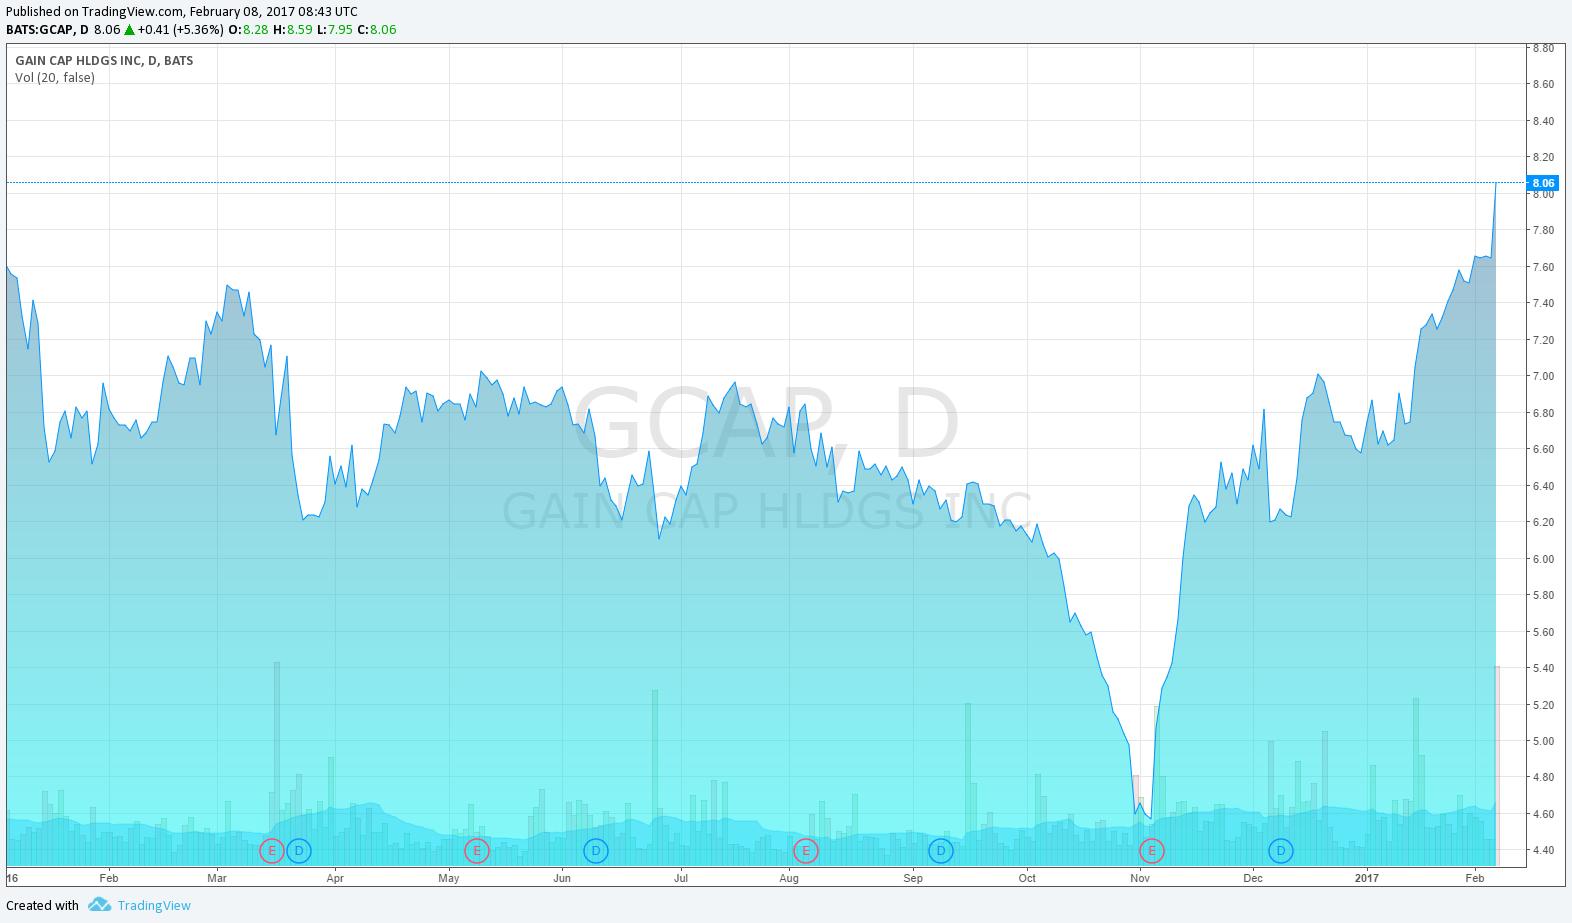 gain-capital-stock-price-chart